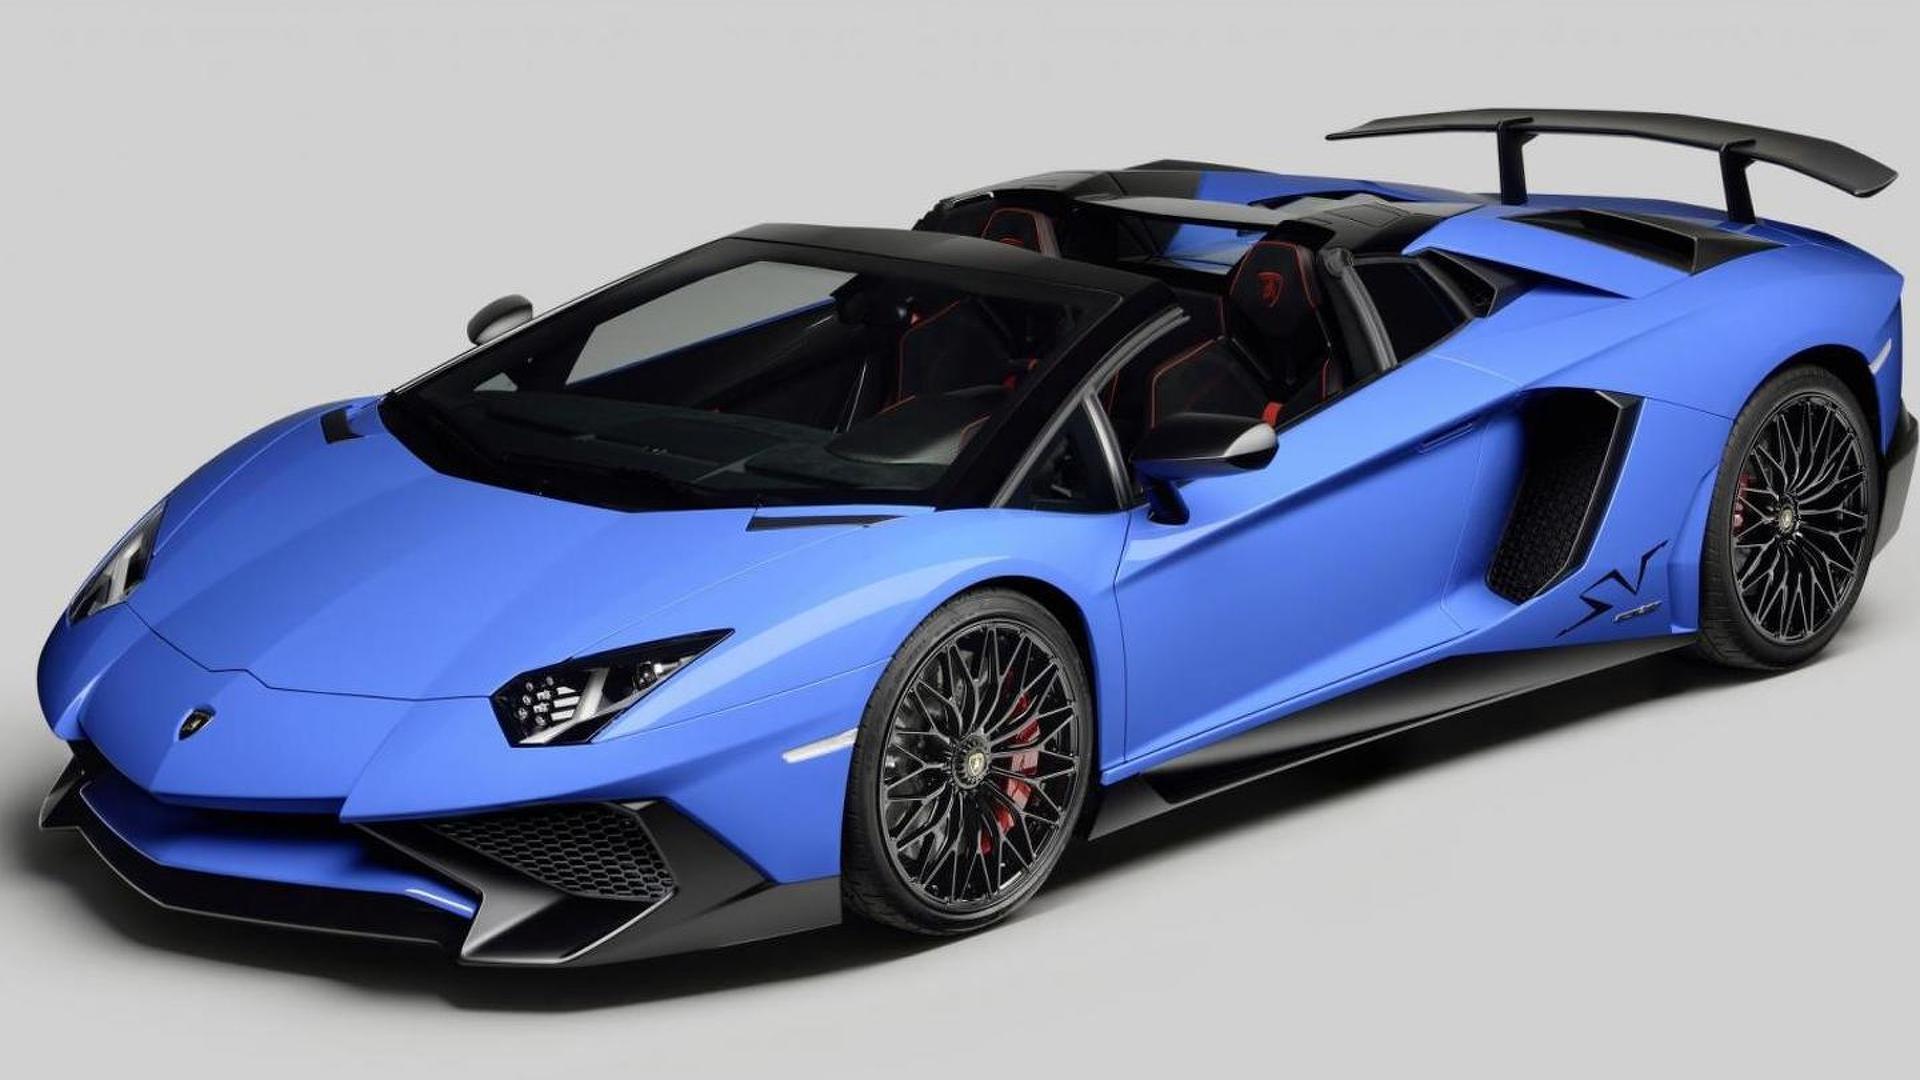 Lamborghini Says Aventador Too Powerful To Go Rwd